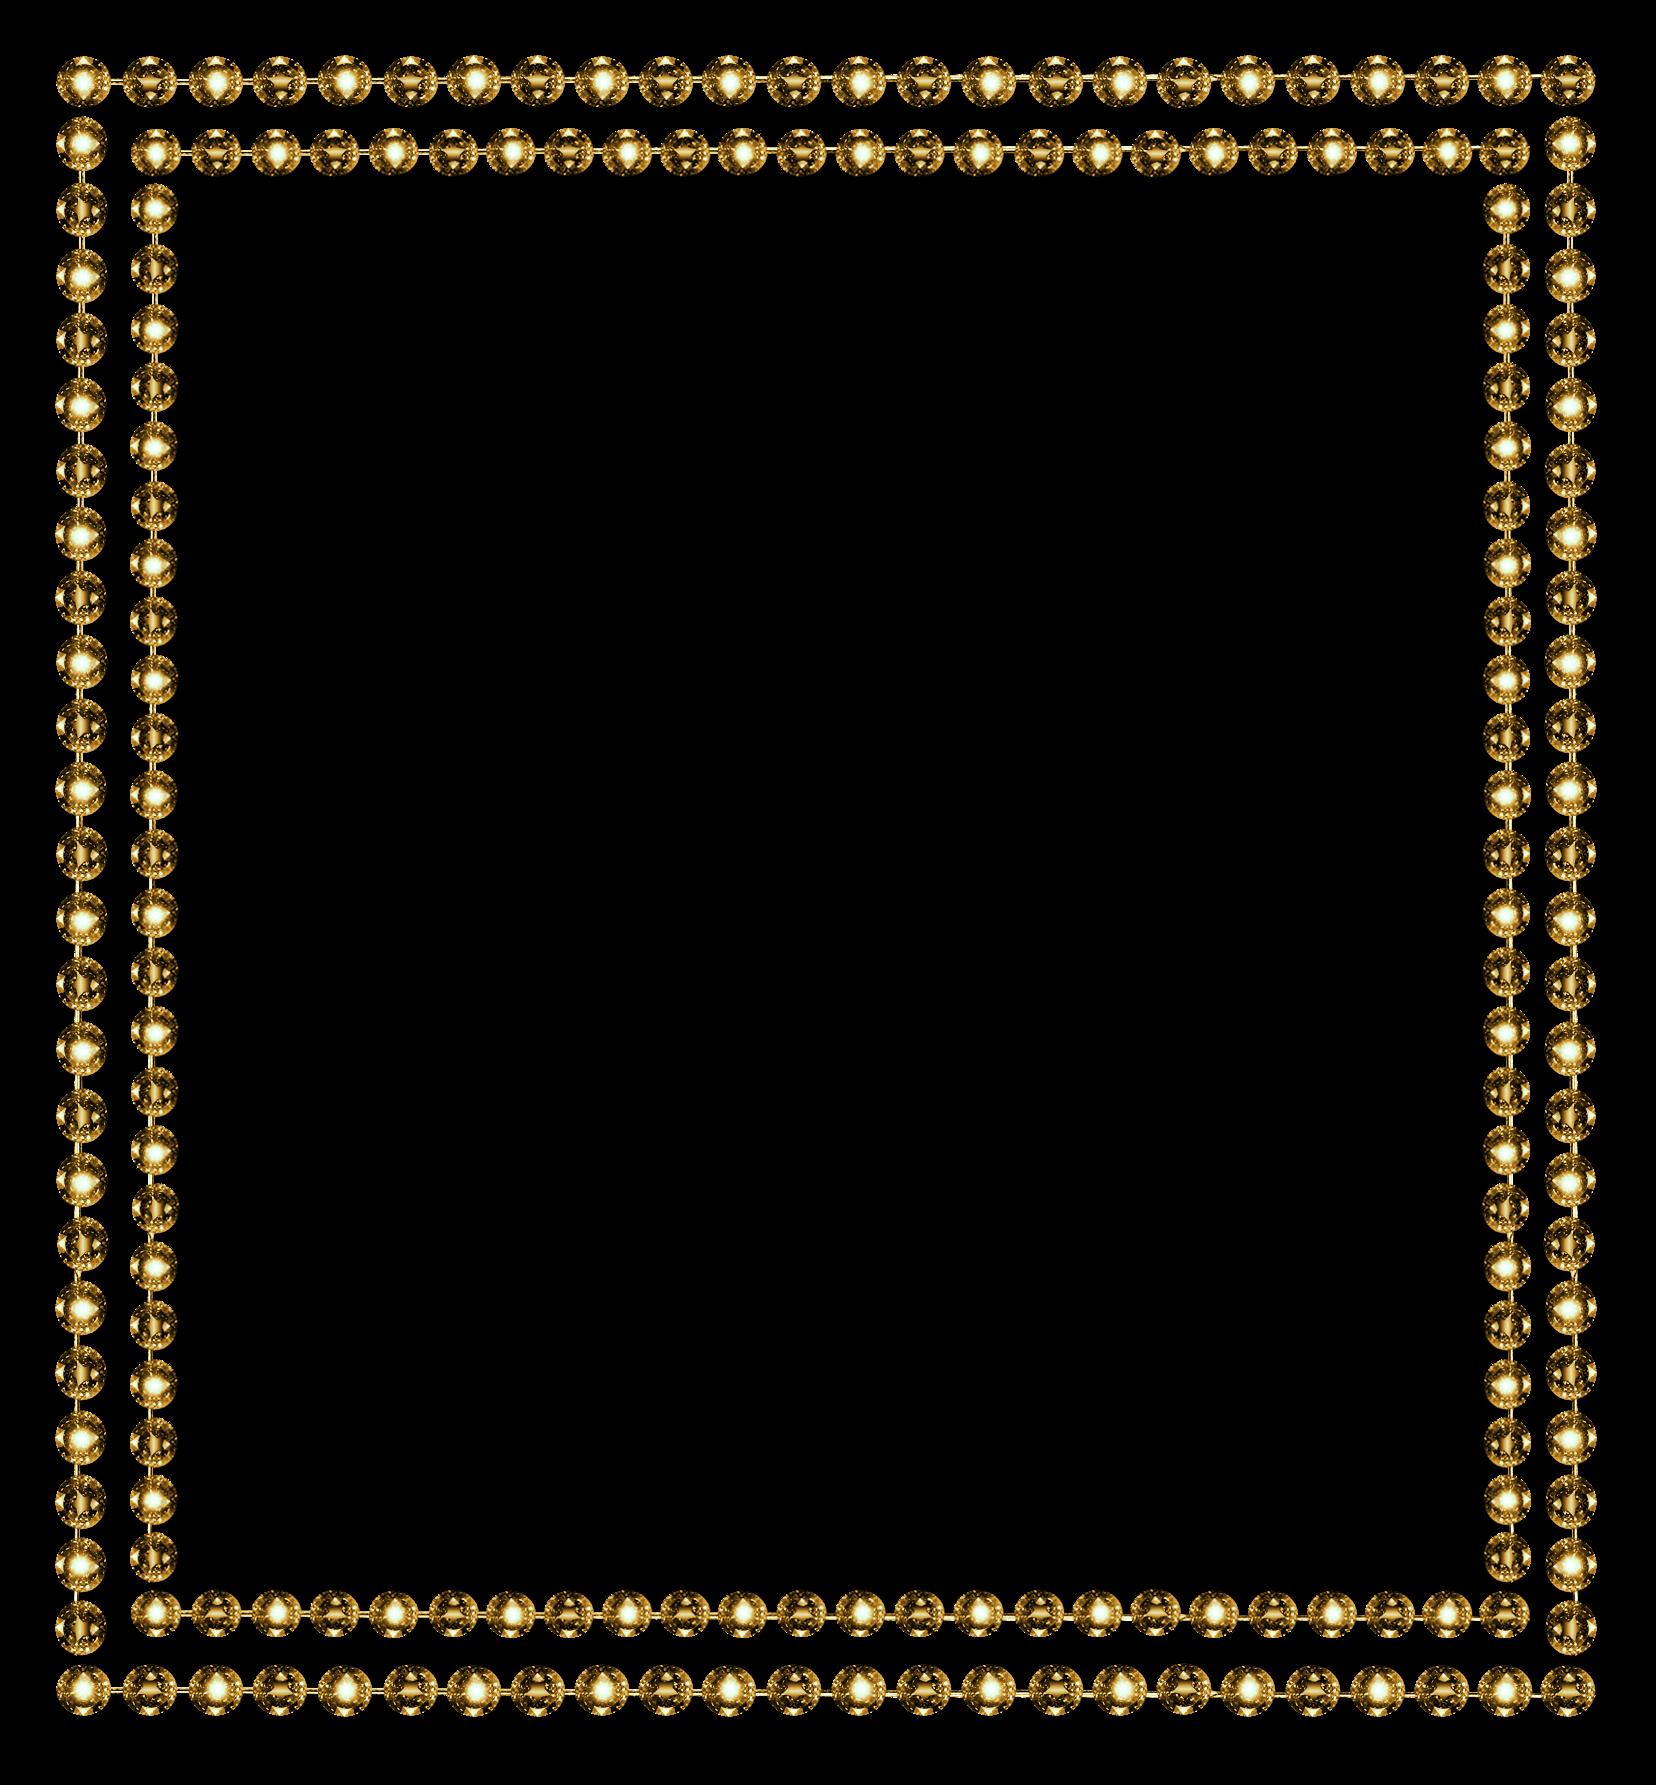 Diamond frame png. Border gold by jssanda